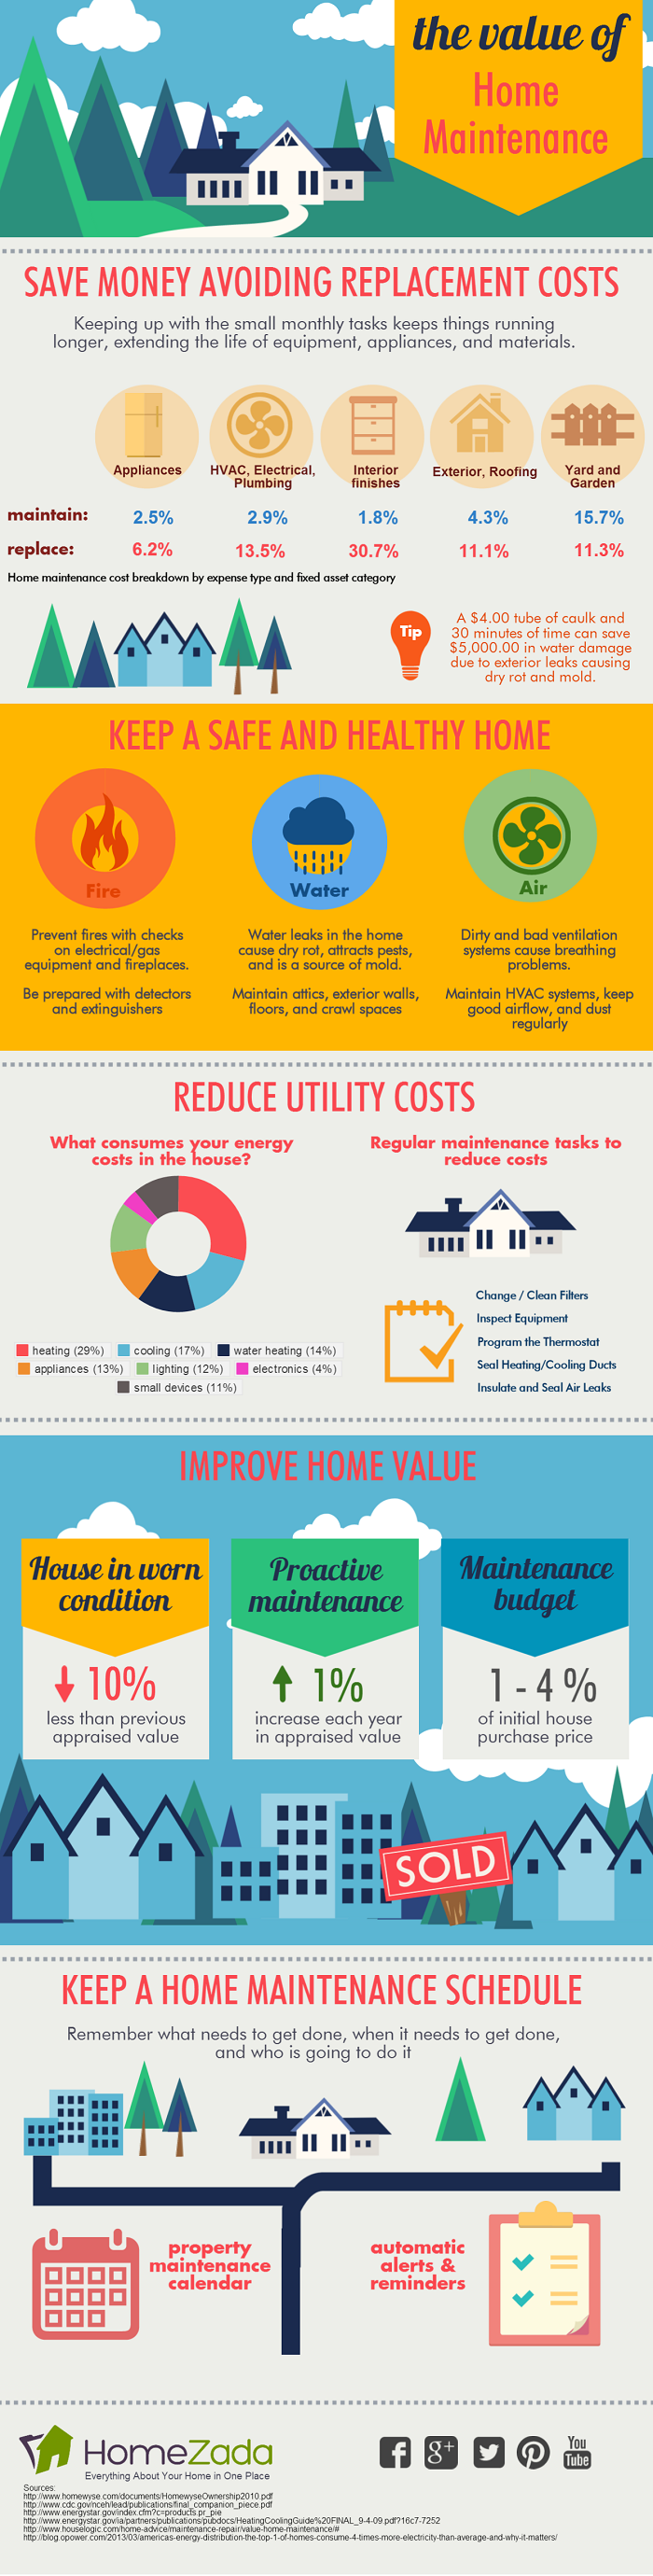 Photo of Hauptwartung Infographic | HomeZada